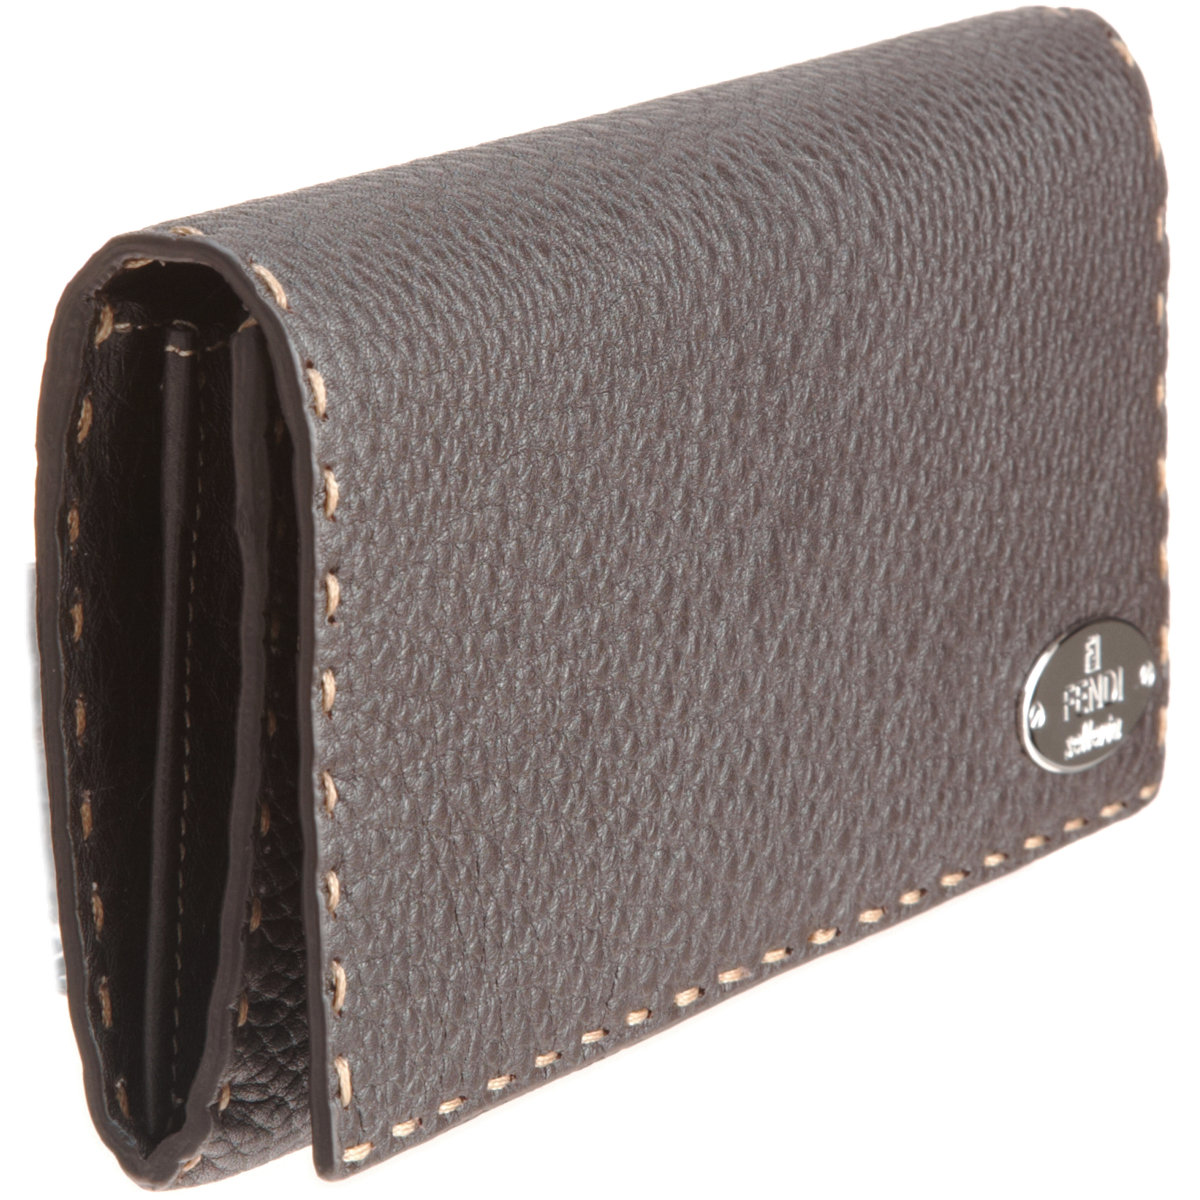 Fendi Selleria continental wallet ZZcSV7mQ2